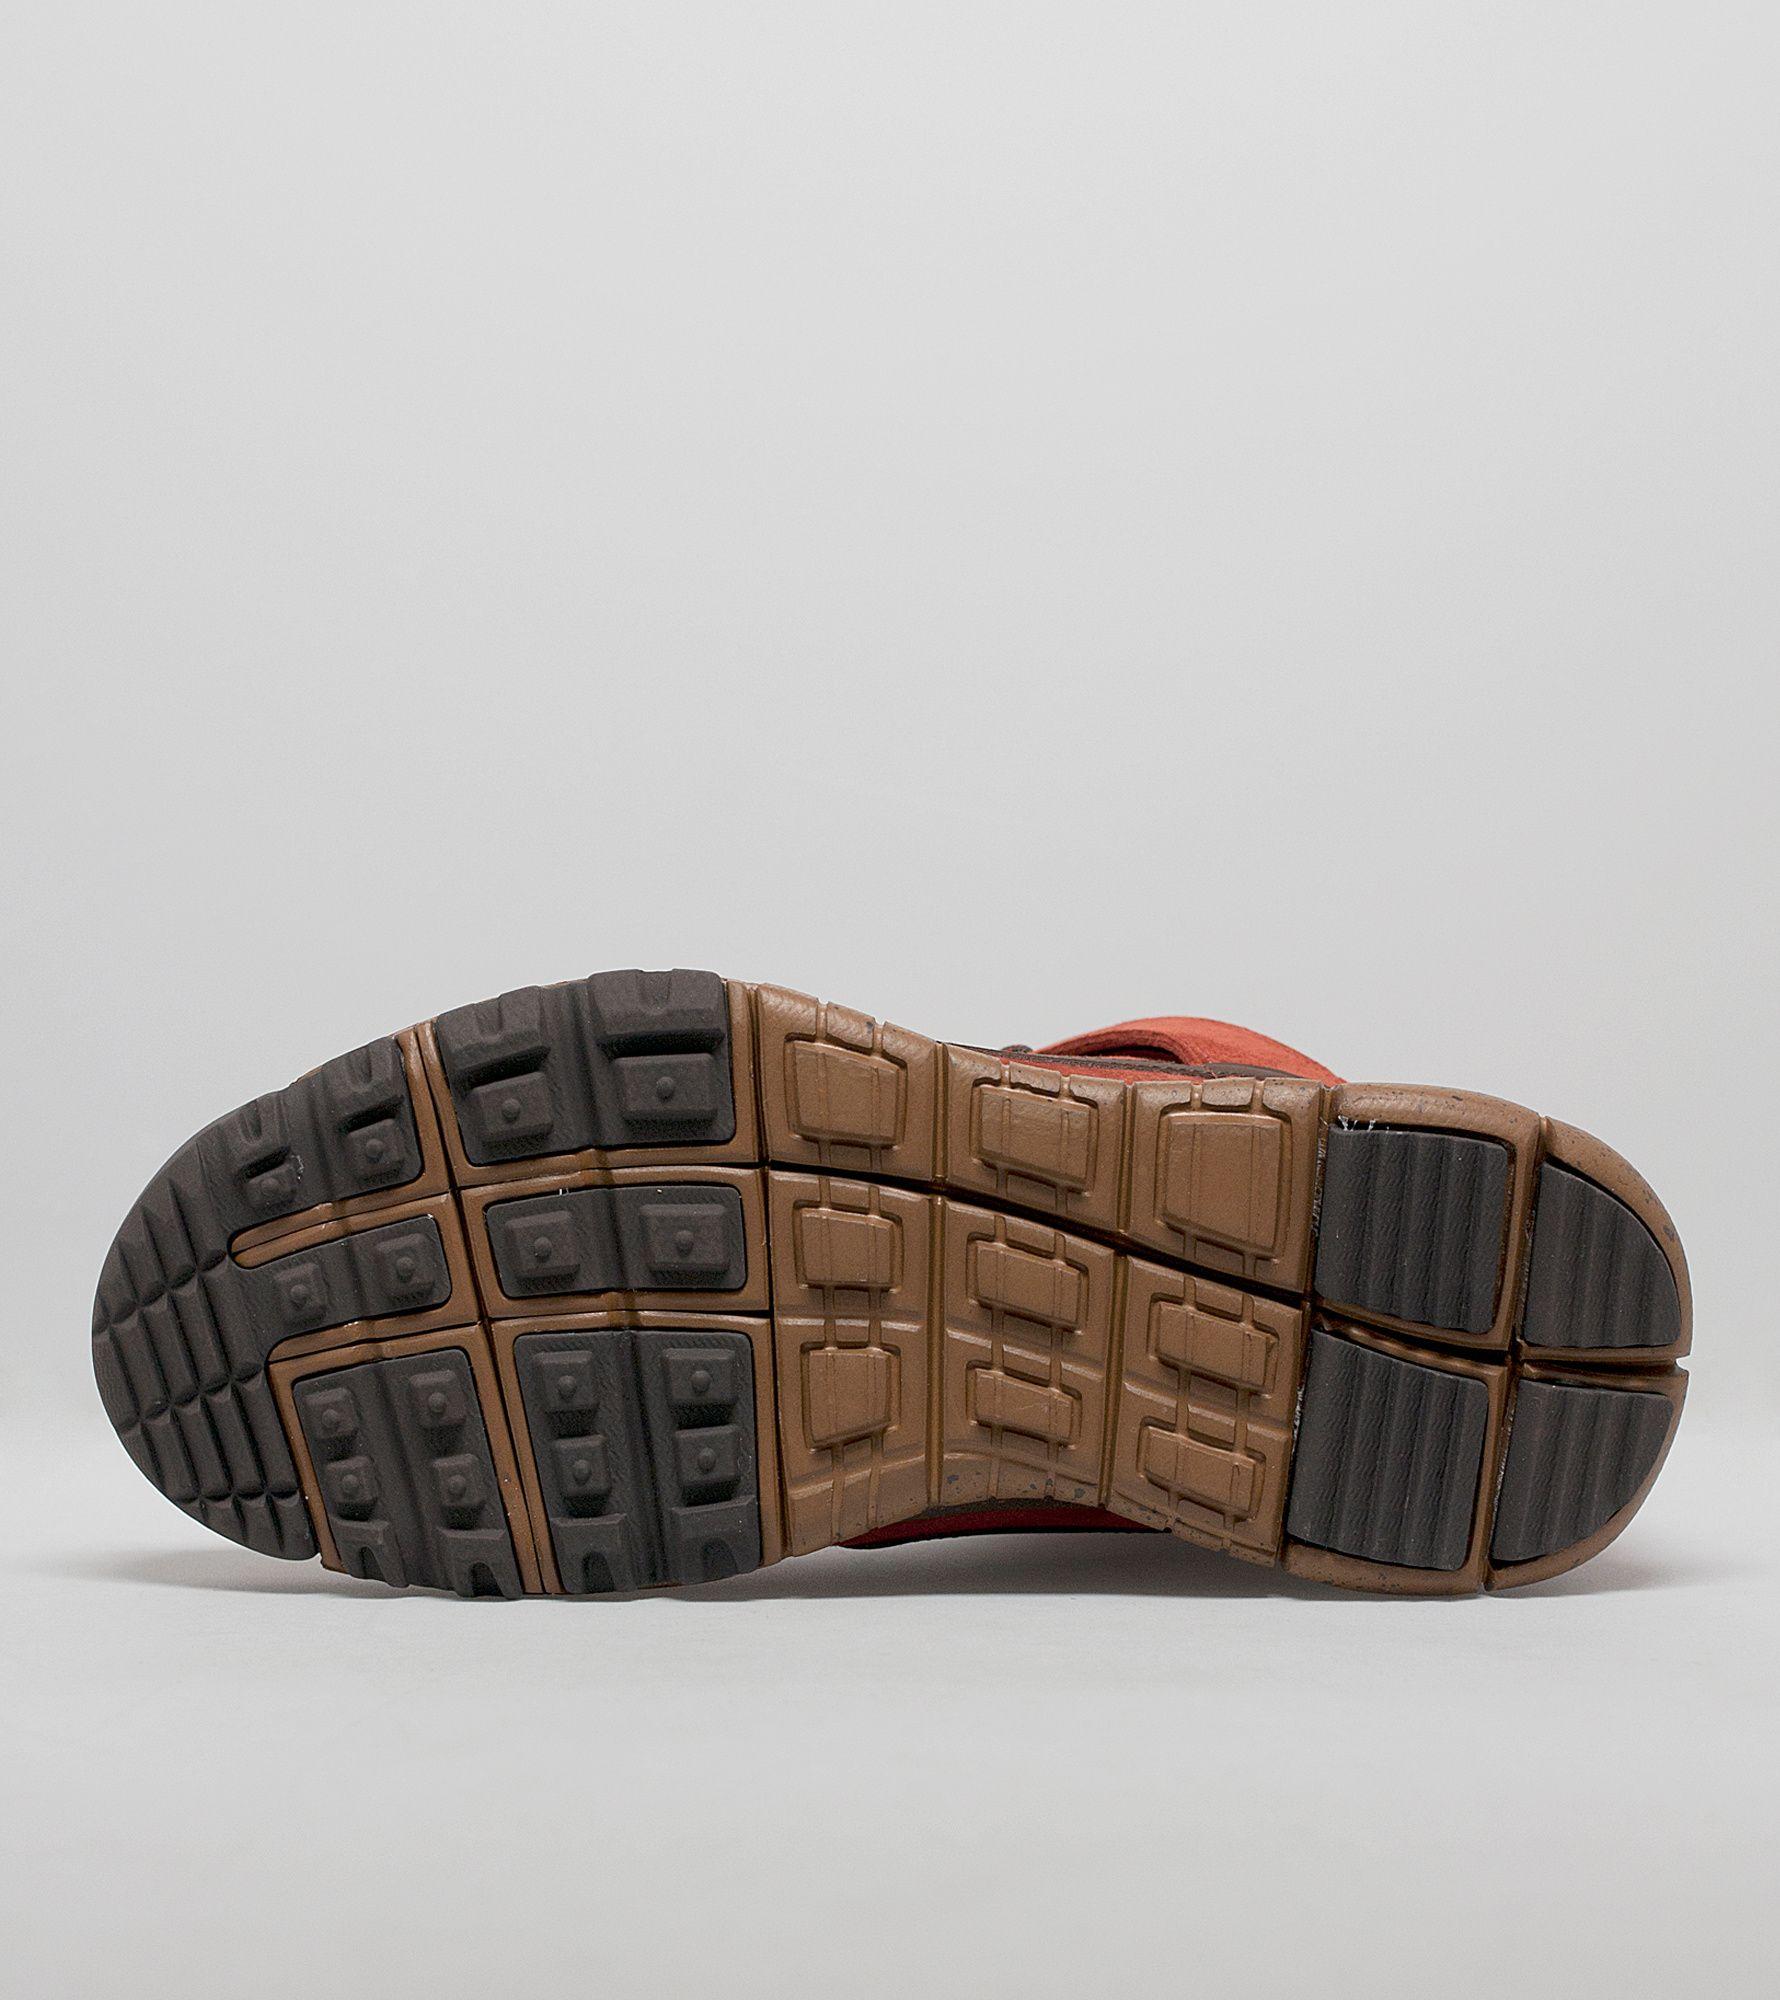 Nike SB x Poler Dunk Hi OMS